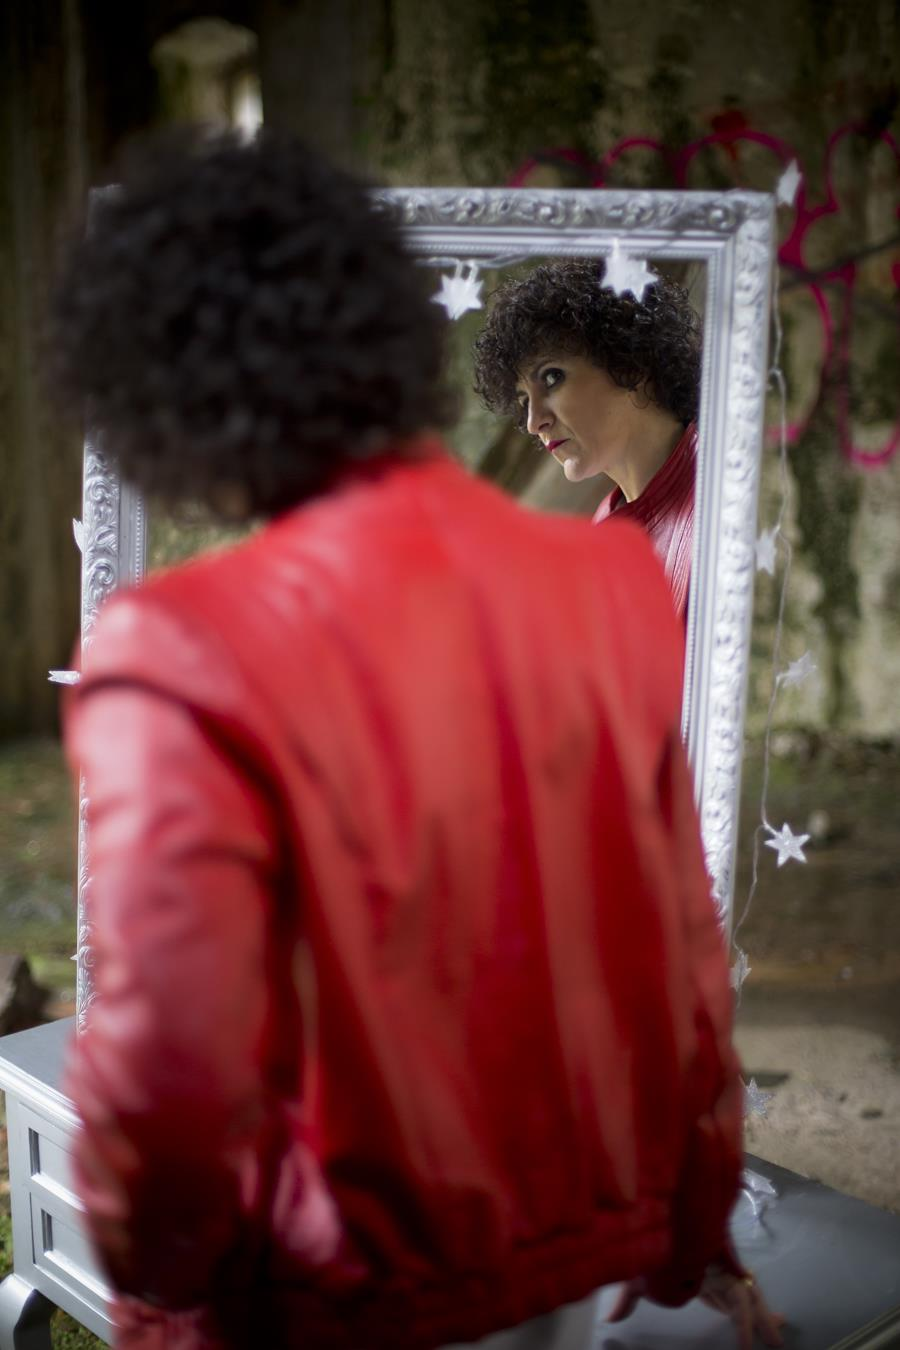 Rebeca Valdivia, asesora de imagen, personal shopper, estilista, stilist, Donostia, San Sebastián, Miss Clov, zapatos salón destalonado, stilettos, Heel shoes, camiseta lecrane, camiseta Michael Jackson, cazadora de cuero, vintage, cazadora Jackson, medias fantasía, soks